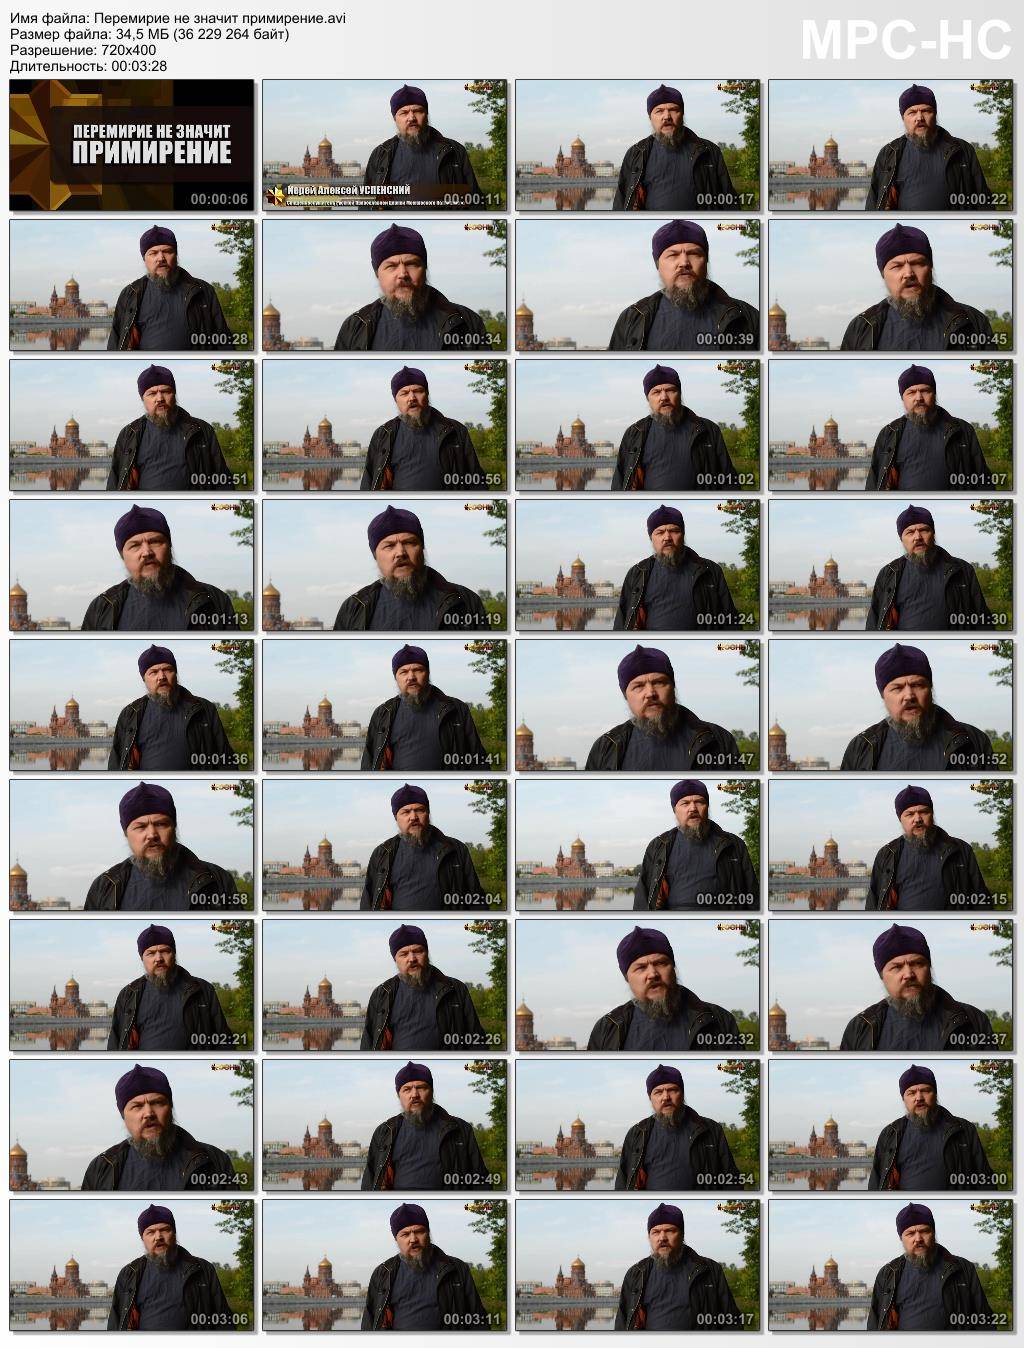 http://i66.fastpic.ru/big/2014/0916/4a/77cabfd888070db45af16426fe22f34a.jpg